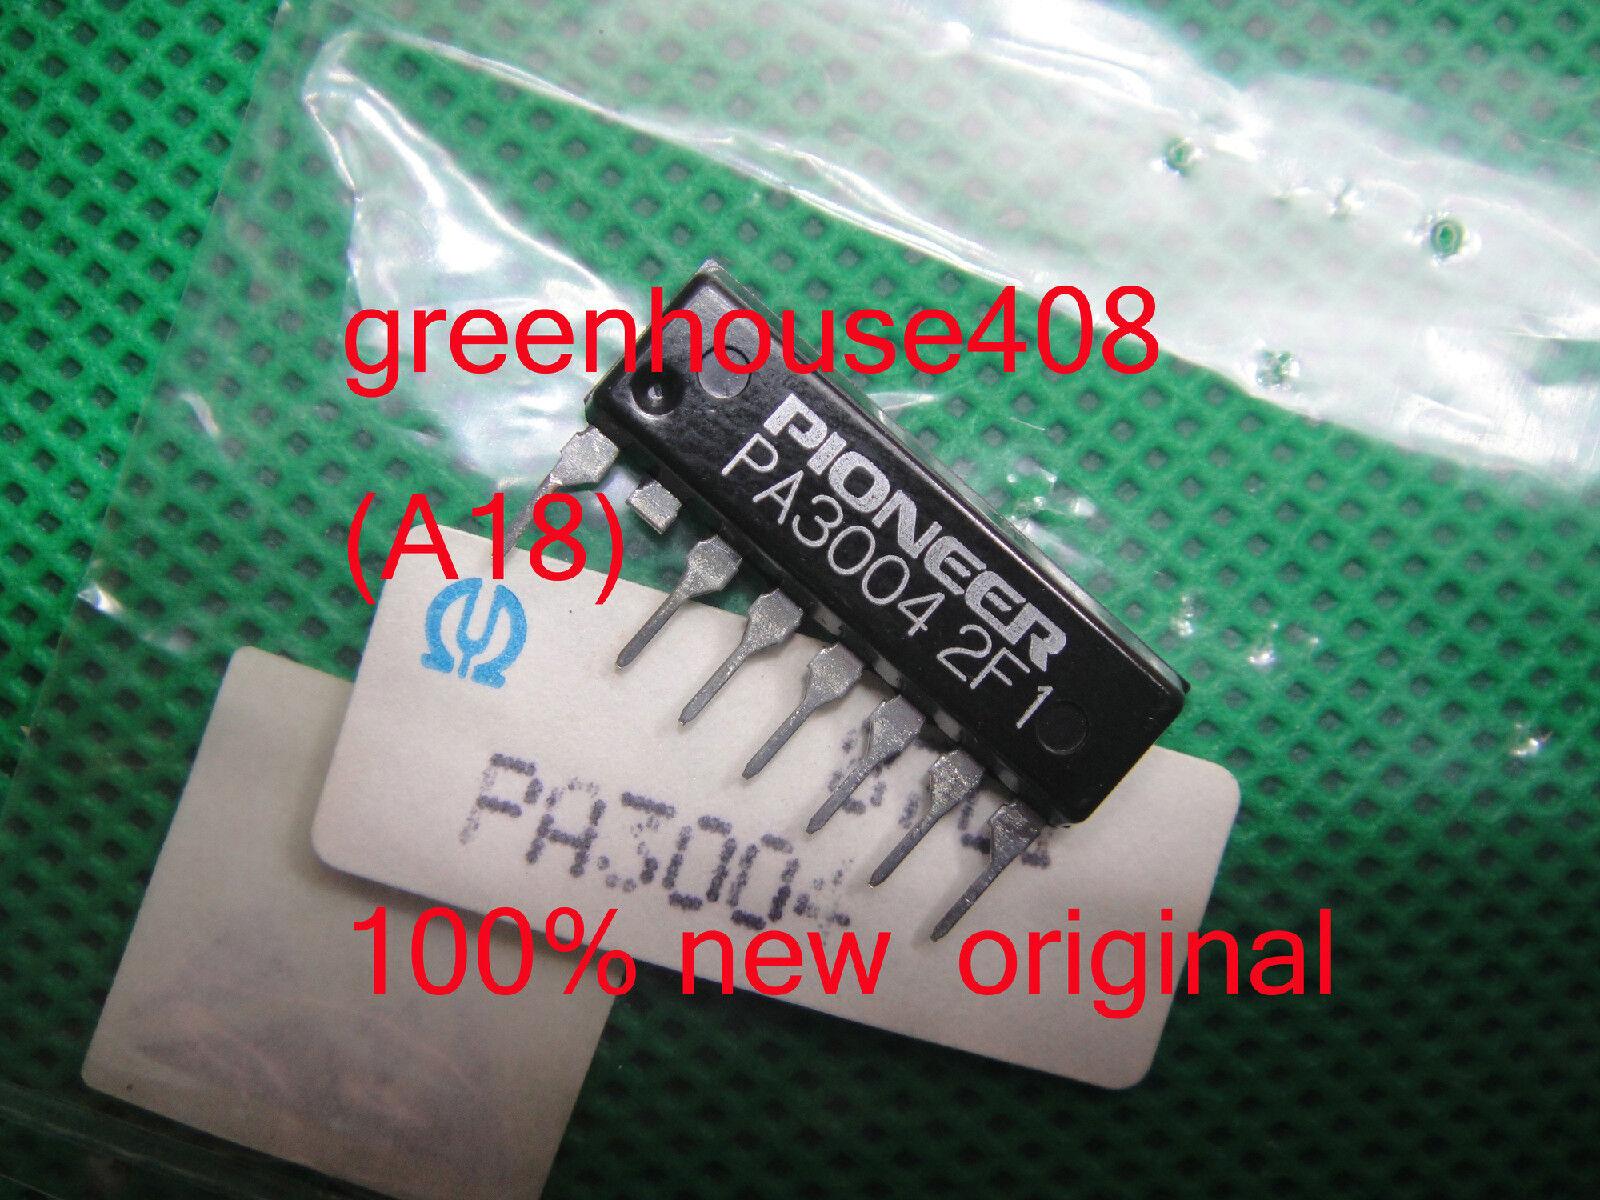 2pcs Original Ic Pioneer Sip 7 8 Pa3004 New Ebay Electronic Components Integrated Circuitsicsicchina Mainland